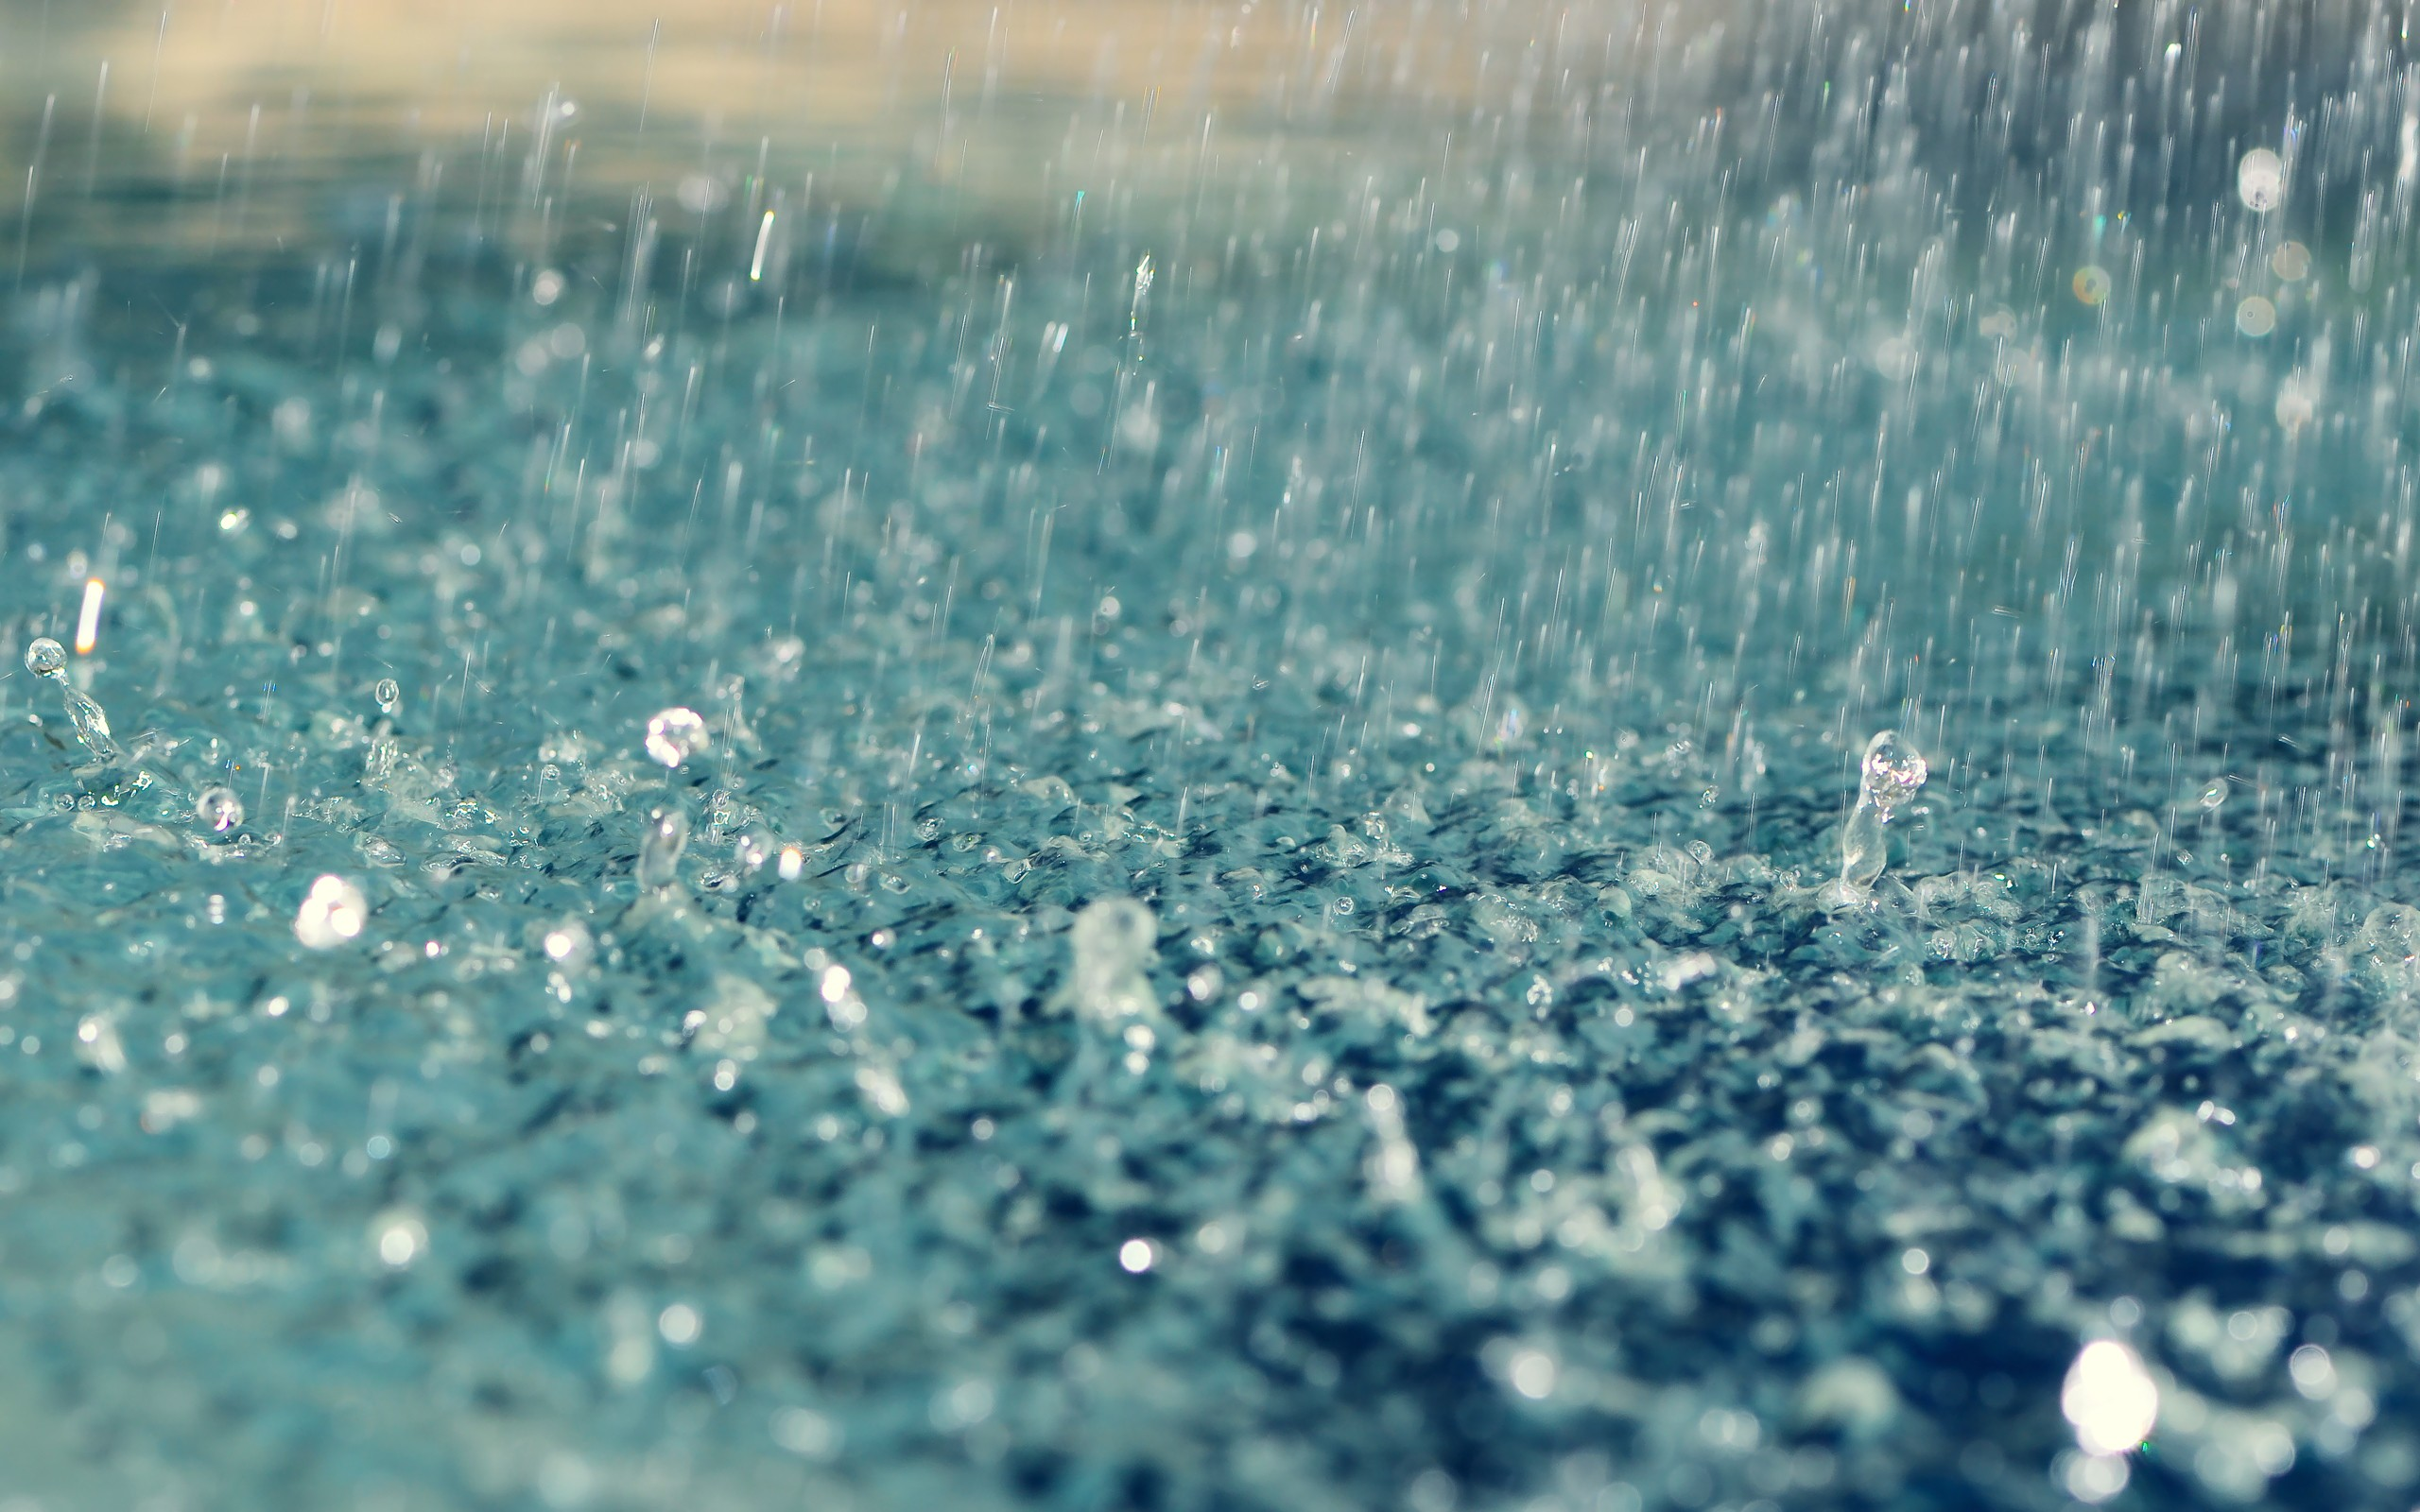 rain cs gorain drop drop top, rain перевод, rain rain go away, rain man, rain cs go, rain over me, rain soul, rain 104, rain international, rain world, rain death, rain steam, rain drop, rain песня, rain core, ryanair, rain sound, rain bird, rain bi, rain check